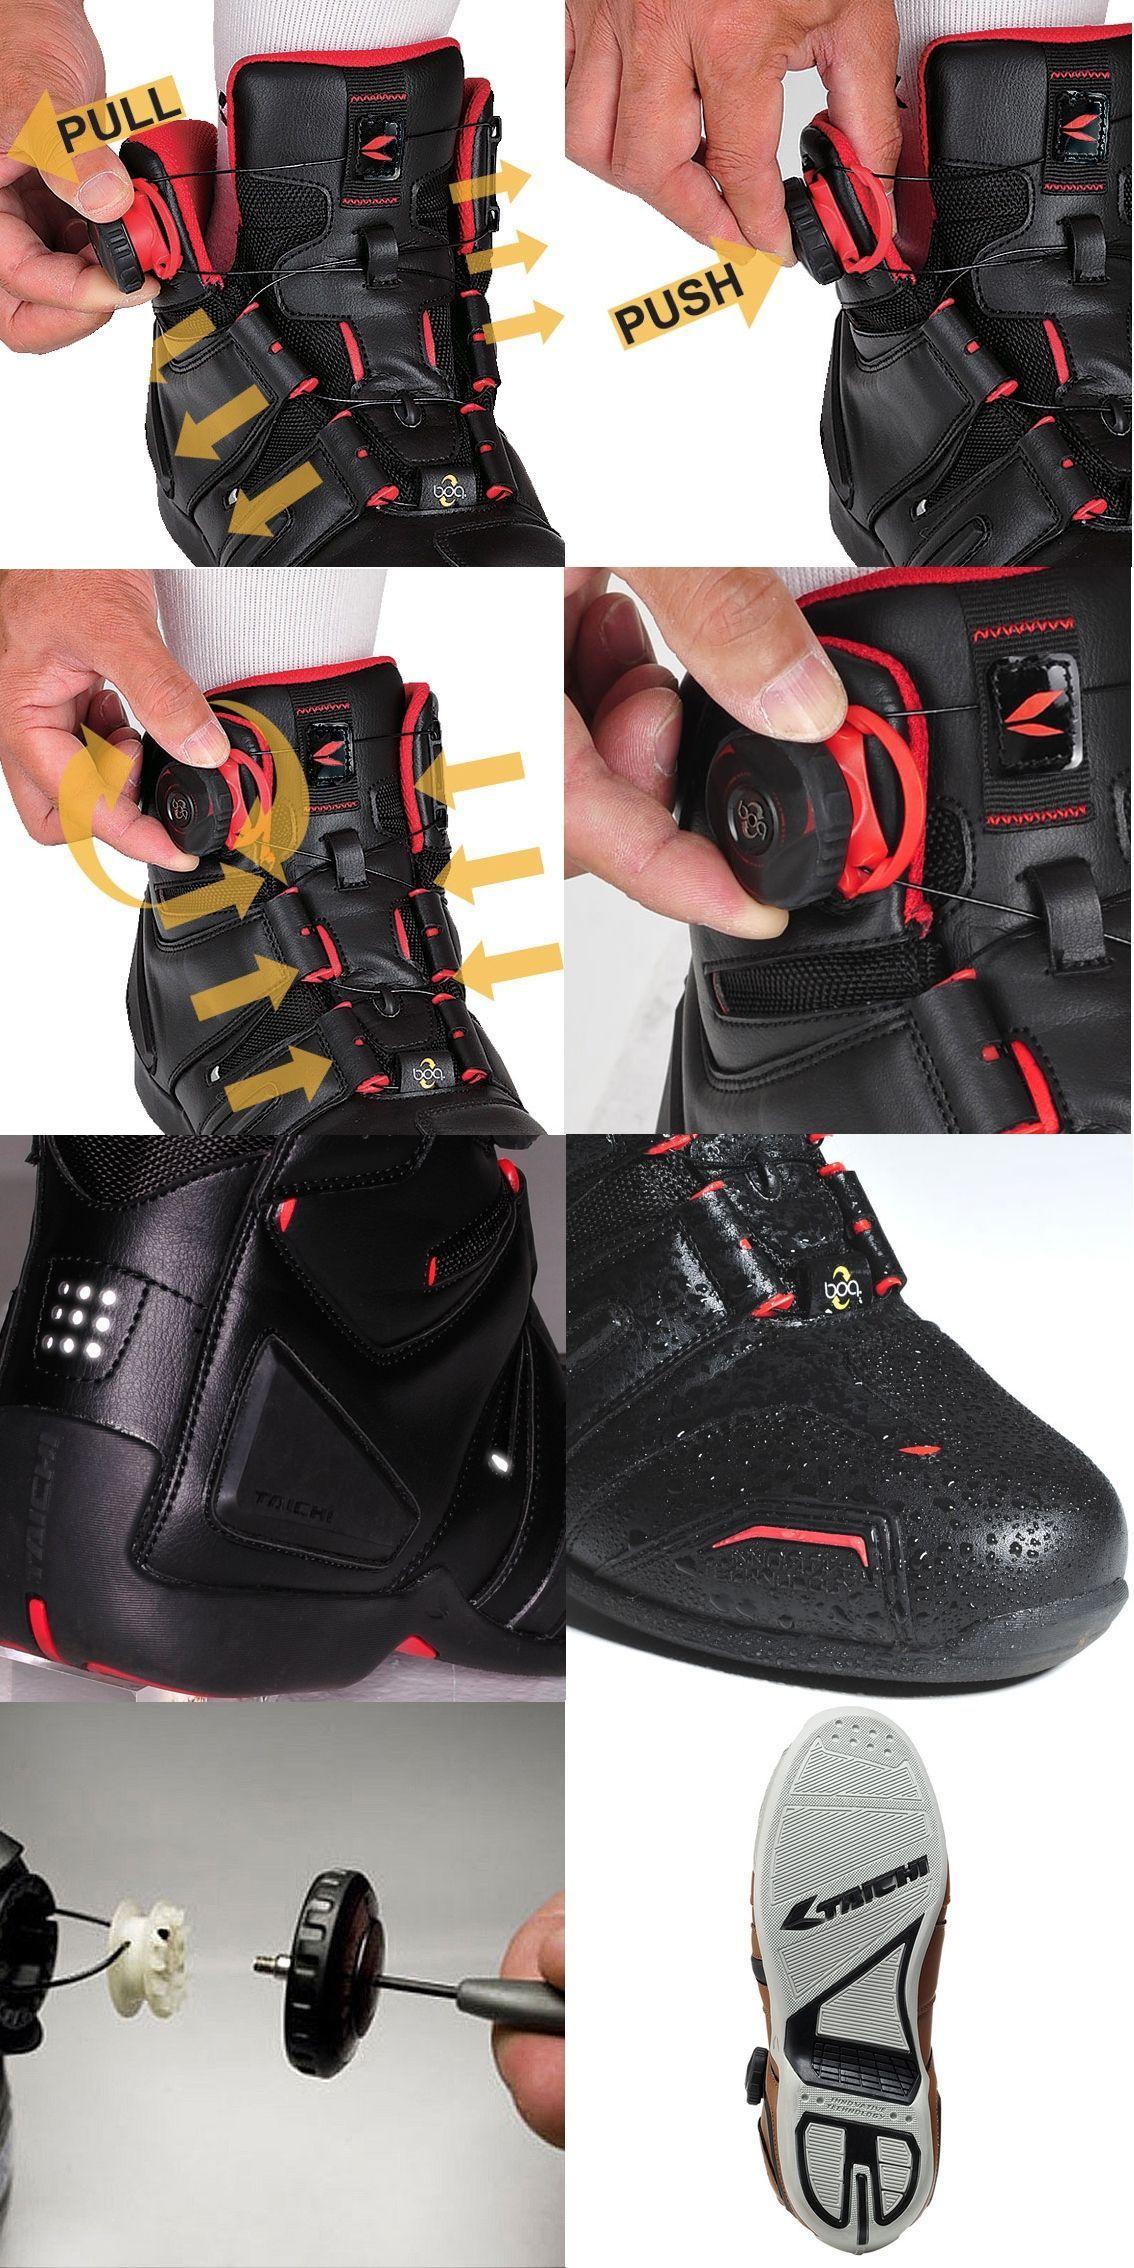 【RS TAICHI】Dry master BOA 騎士靴 - 「Webike-摩托百貨」